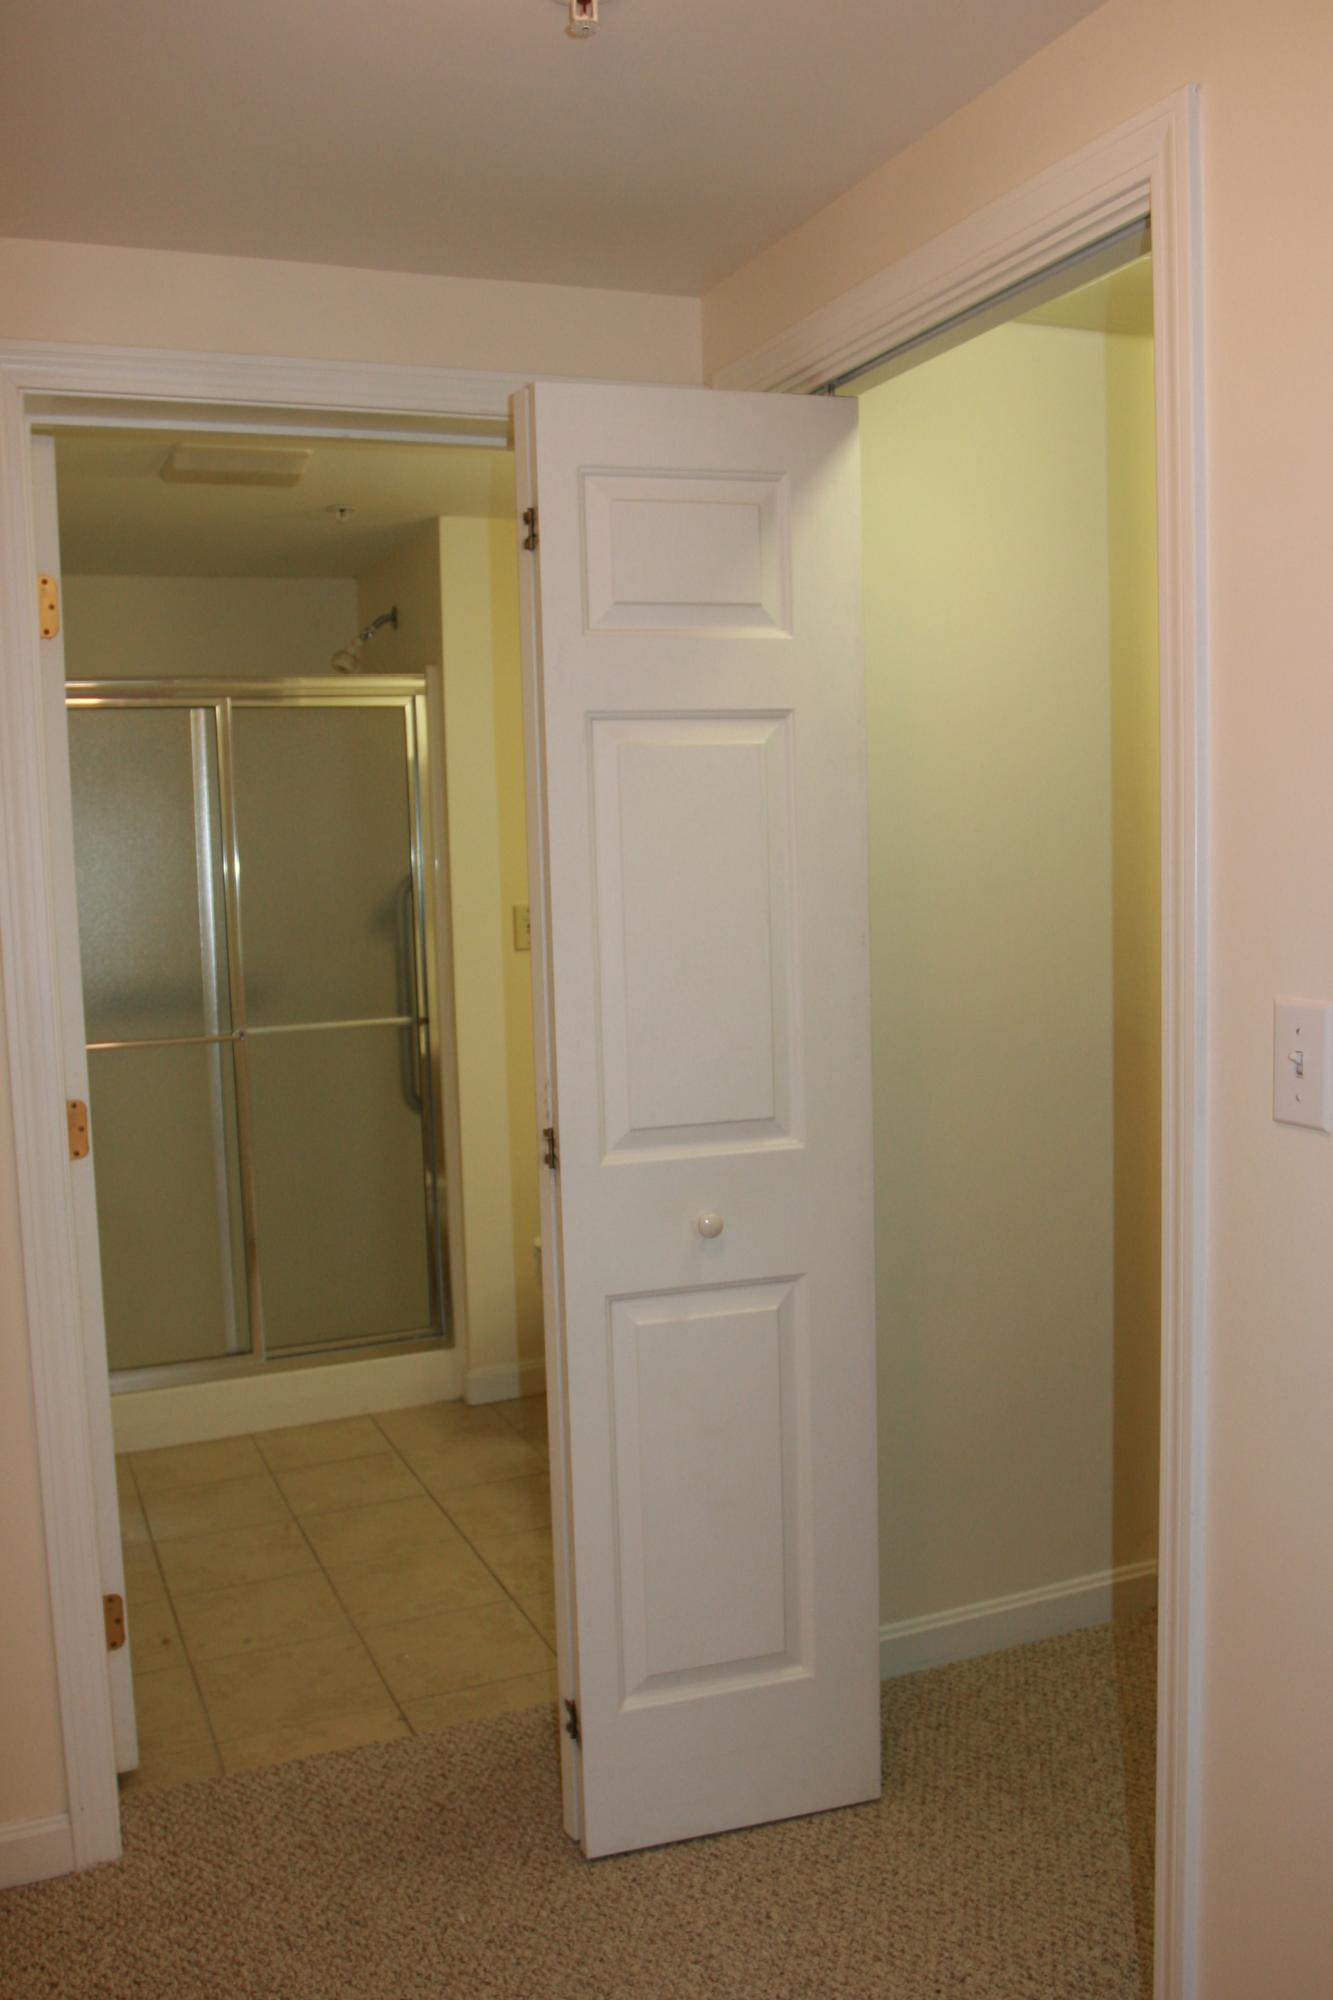 photo 8 912 Main Street, Chatham MA, 02633